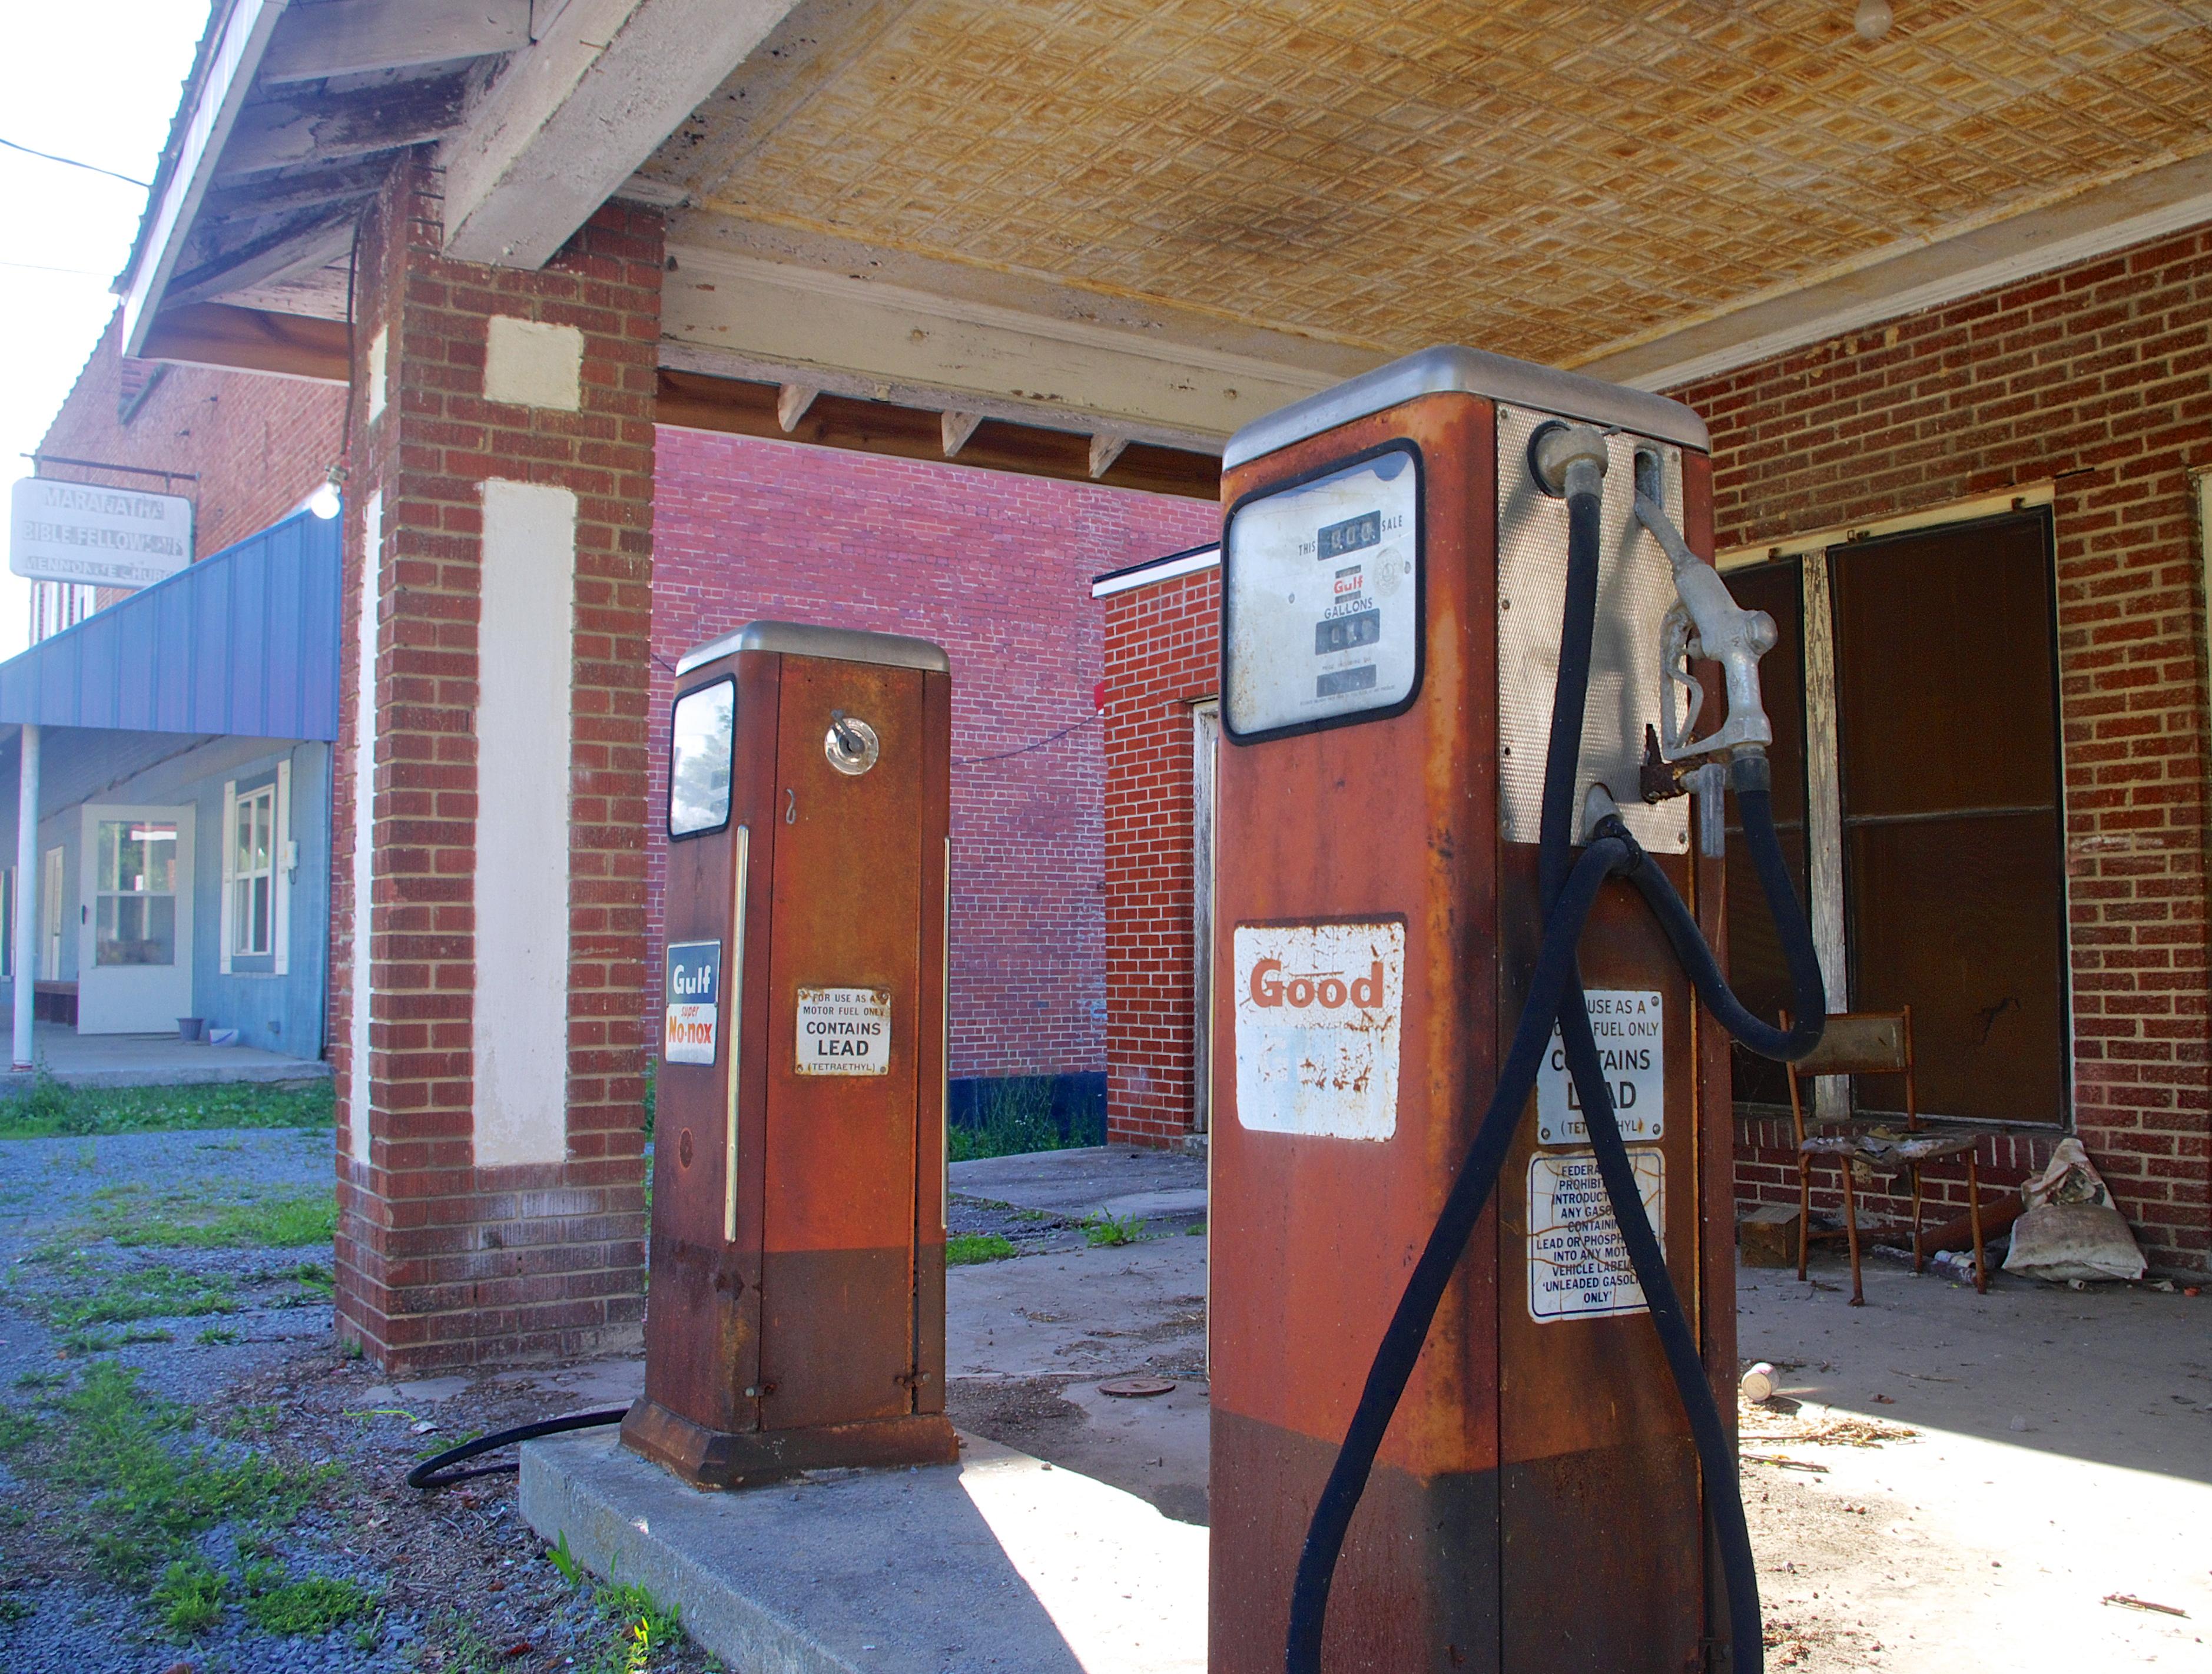 File:Ewing-old-gas-pumps-va jpg - Wikimedia Commons